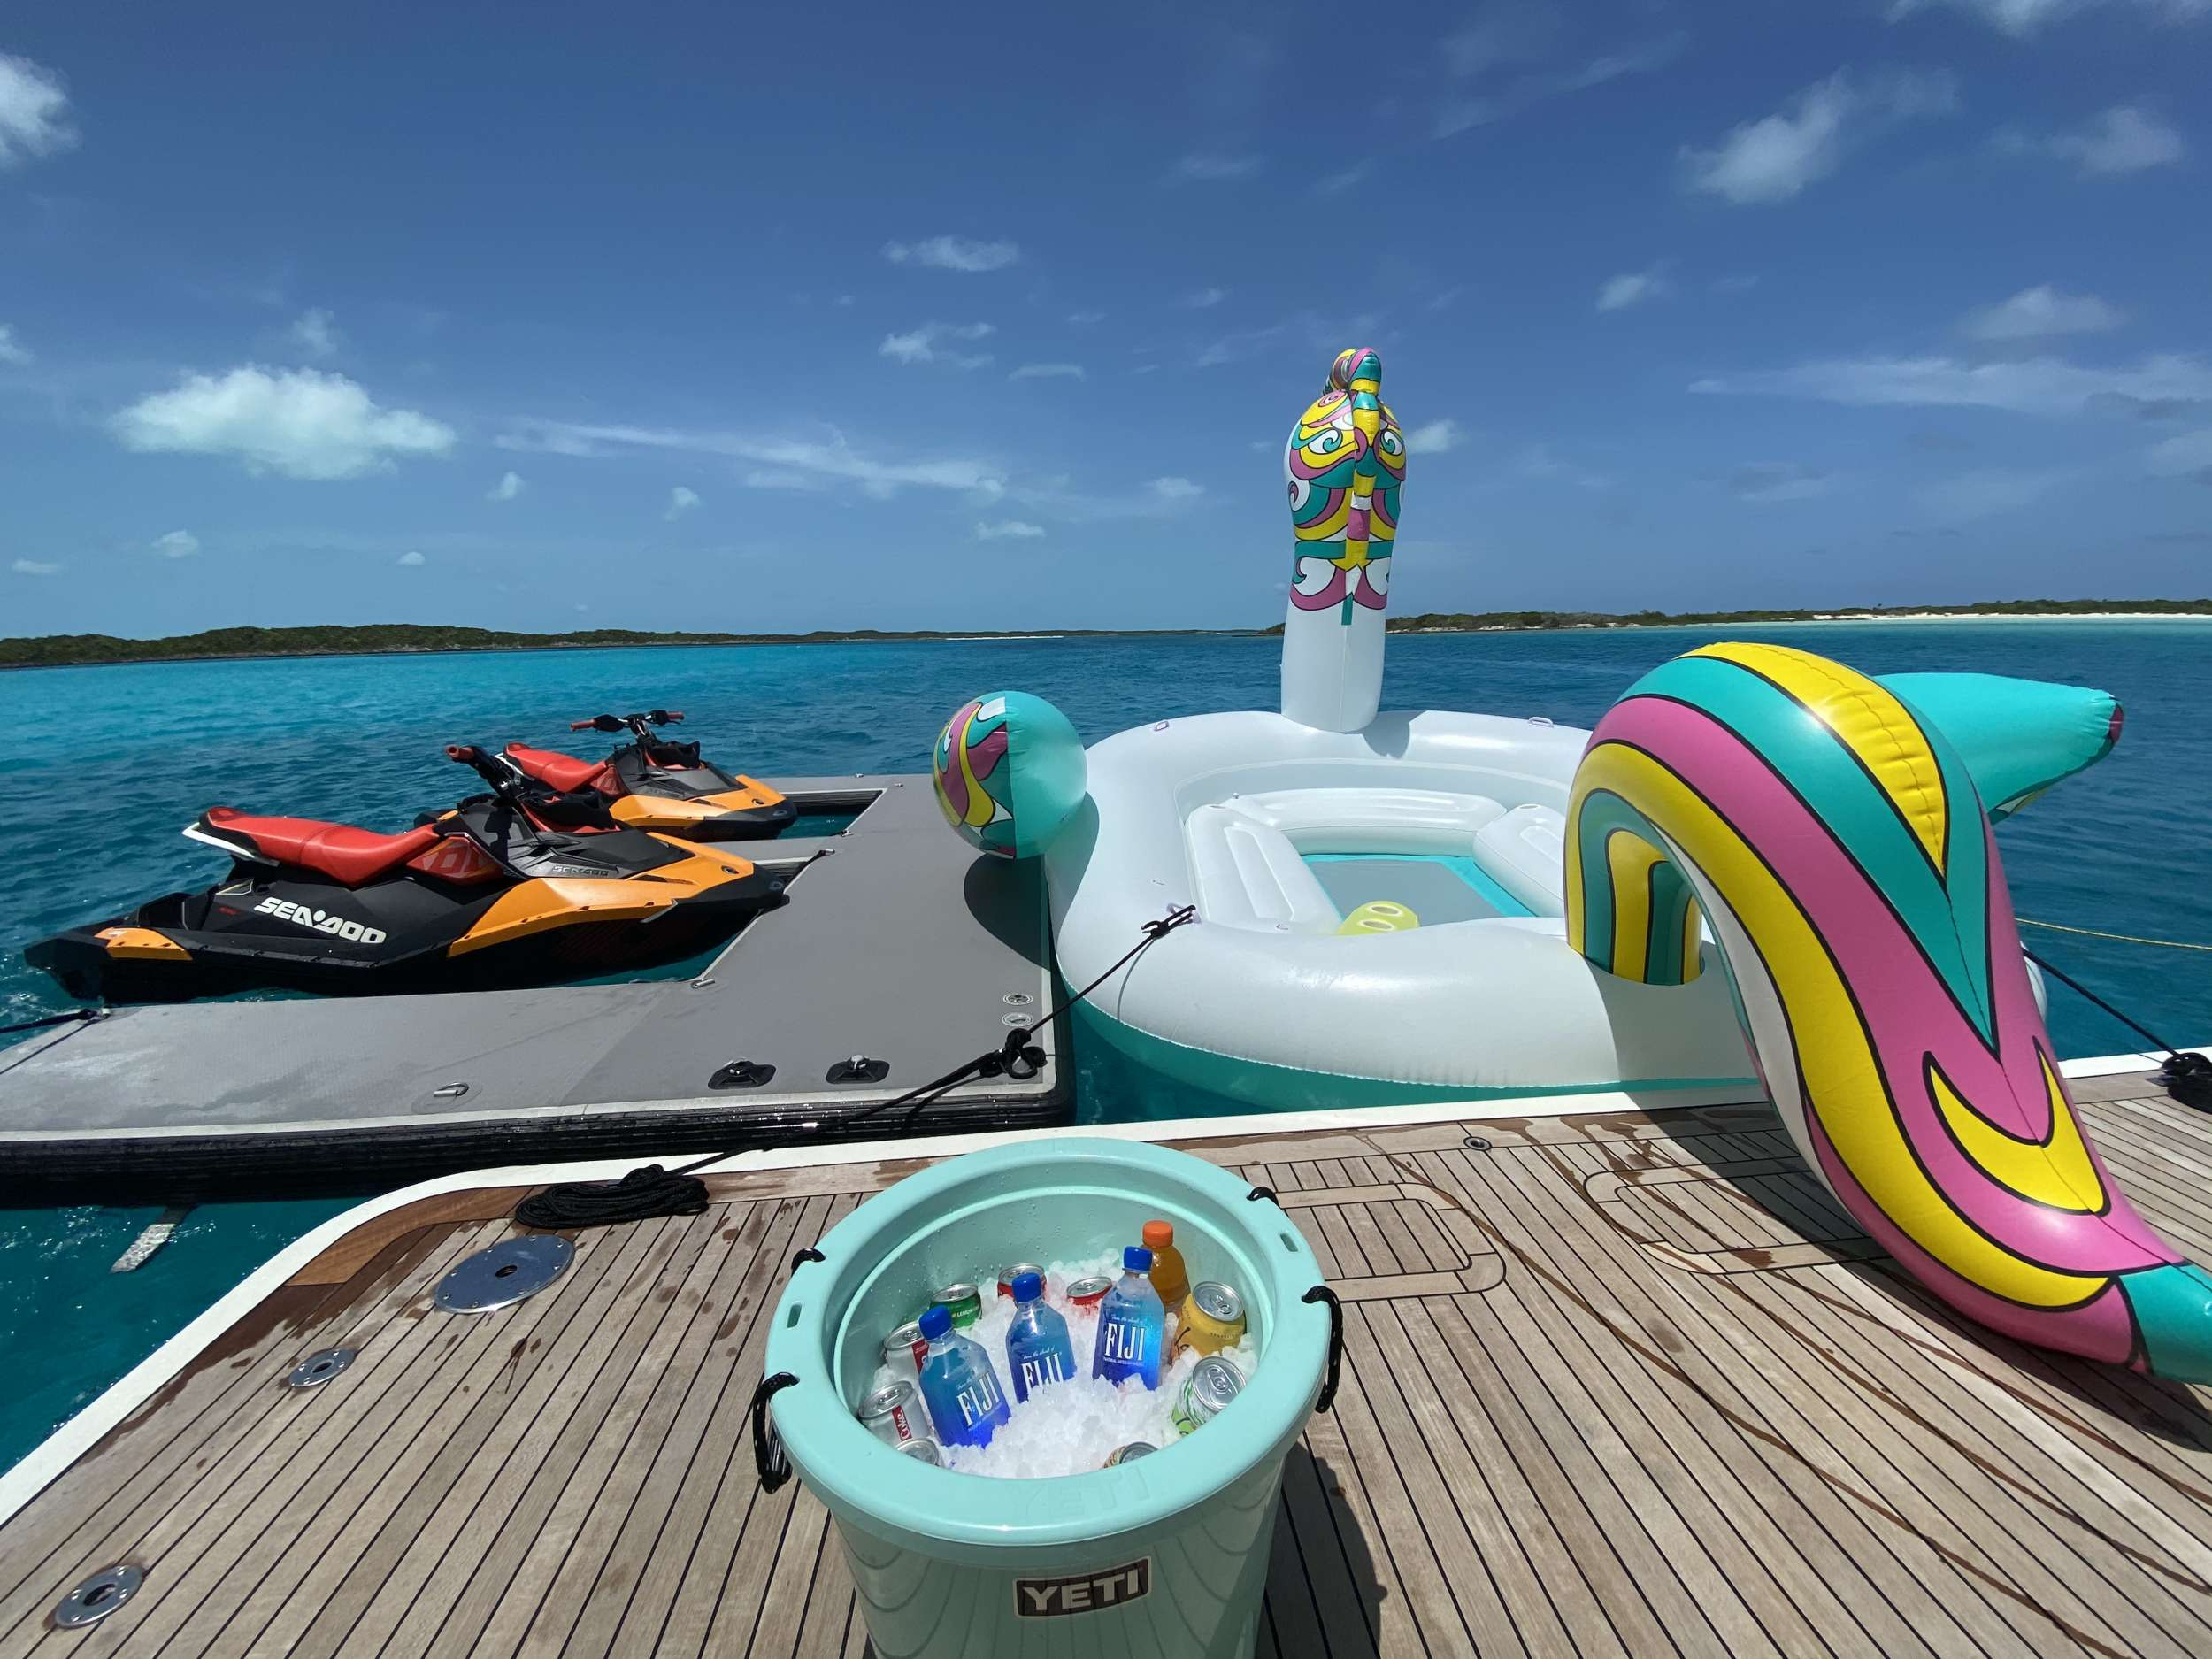 Image of Sweet Emocean yacht #14